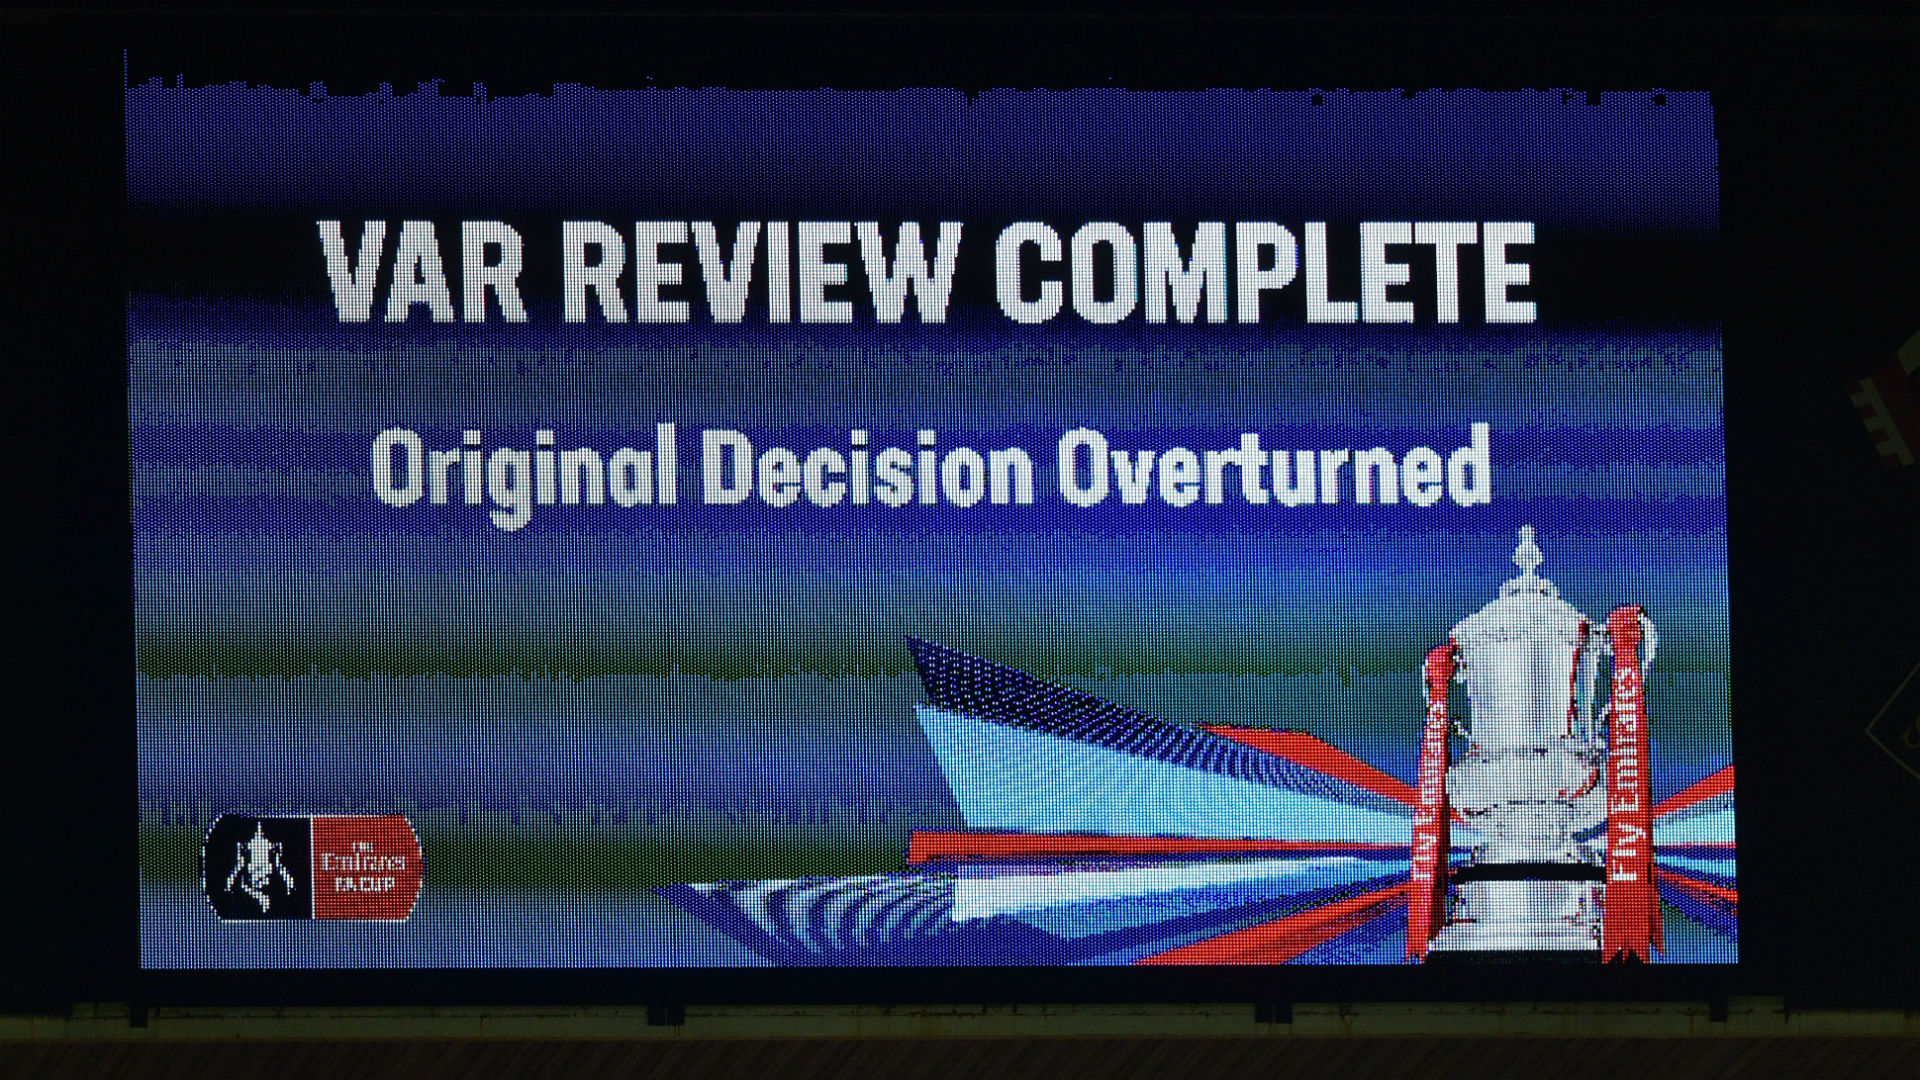 VAR review